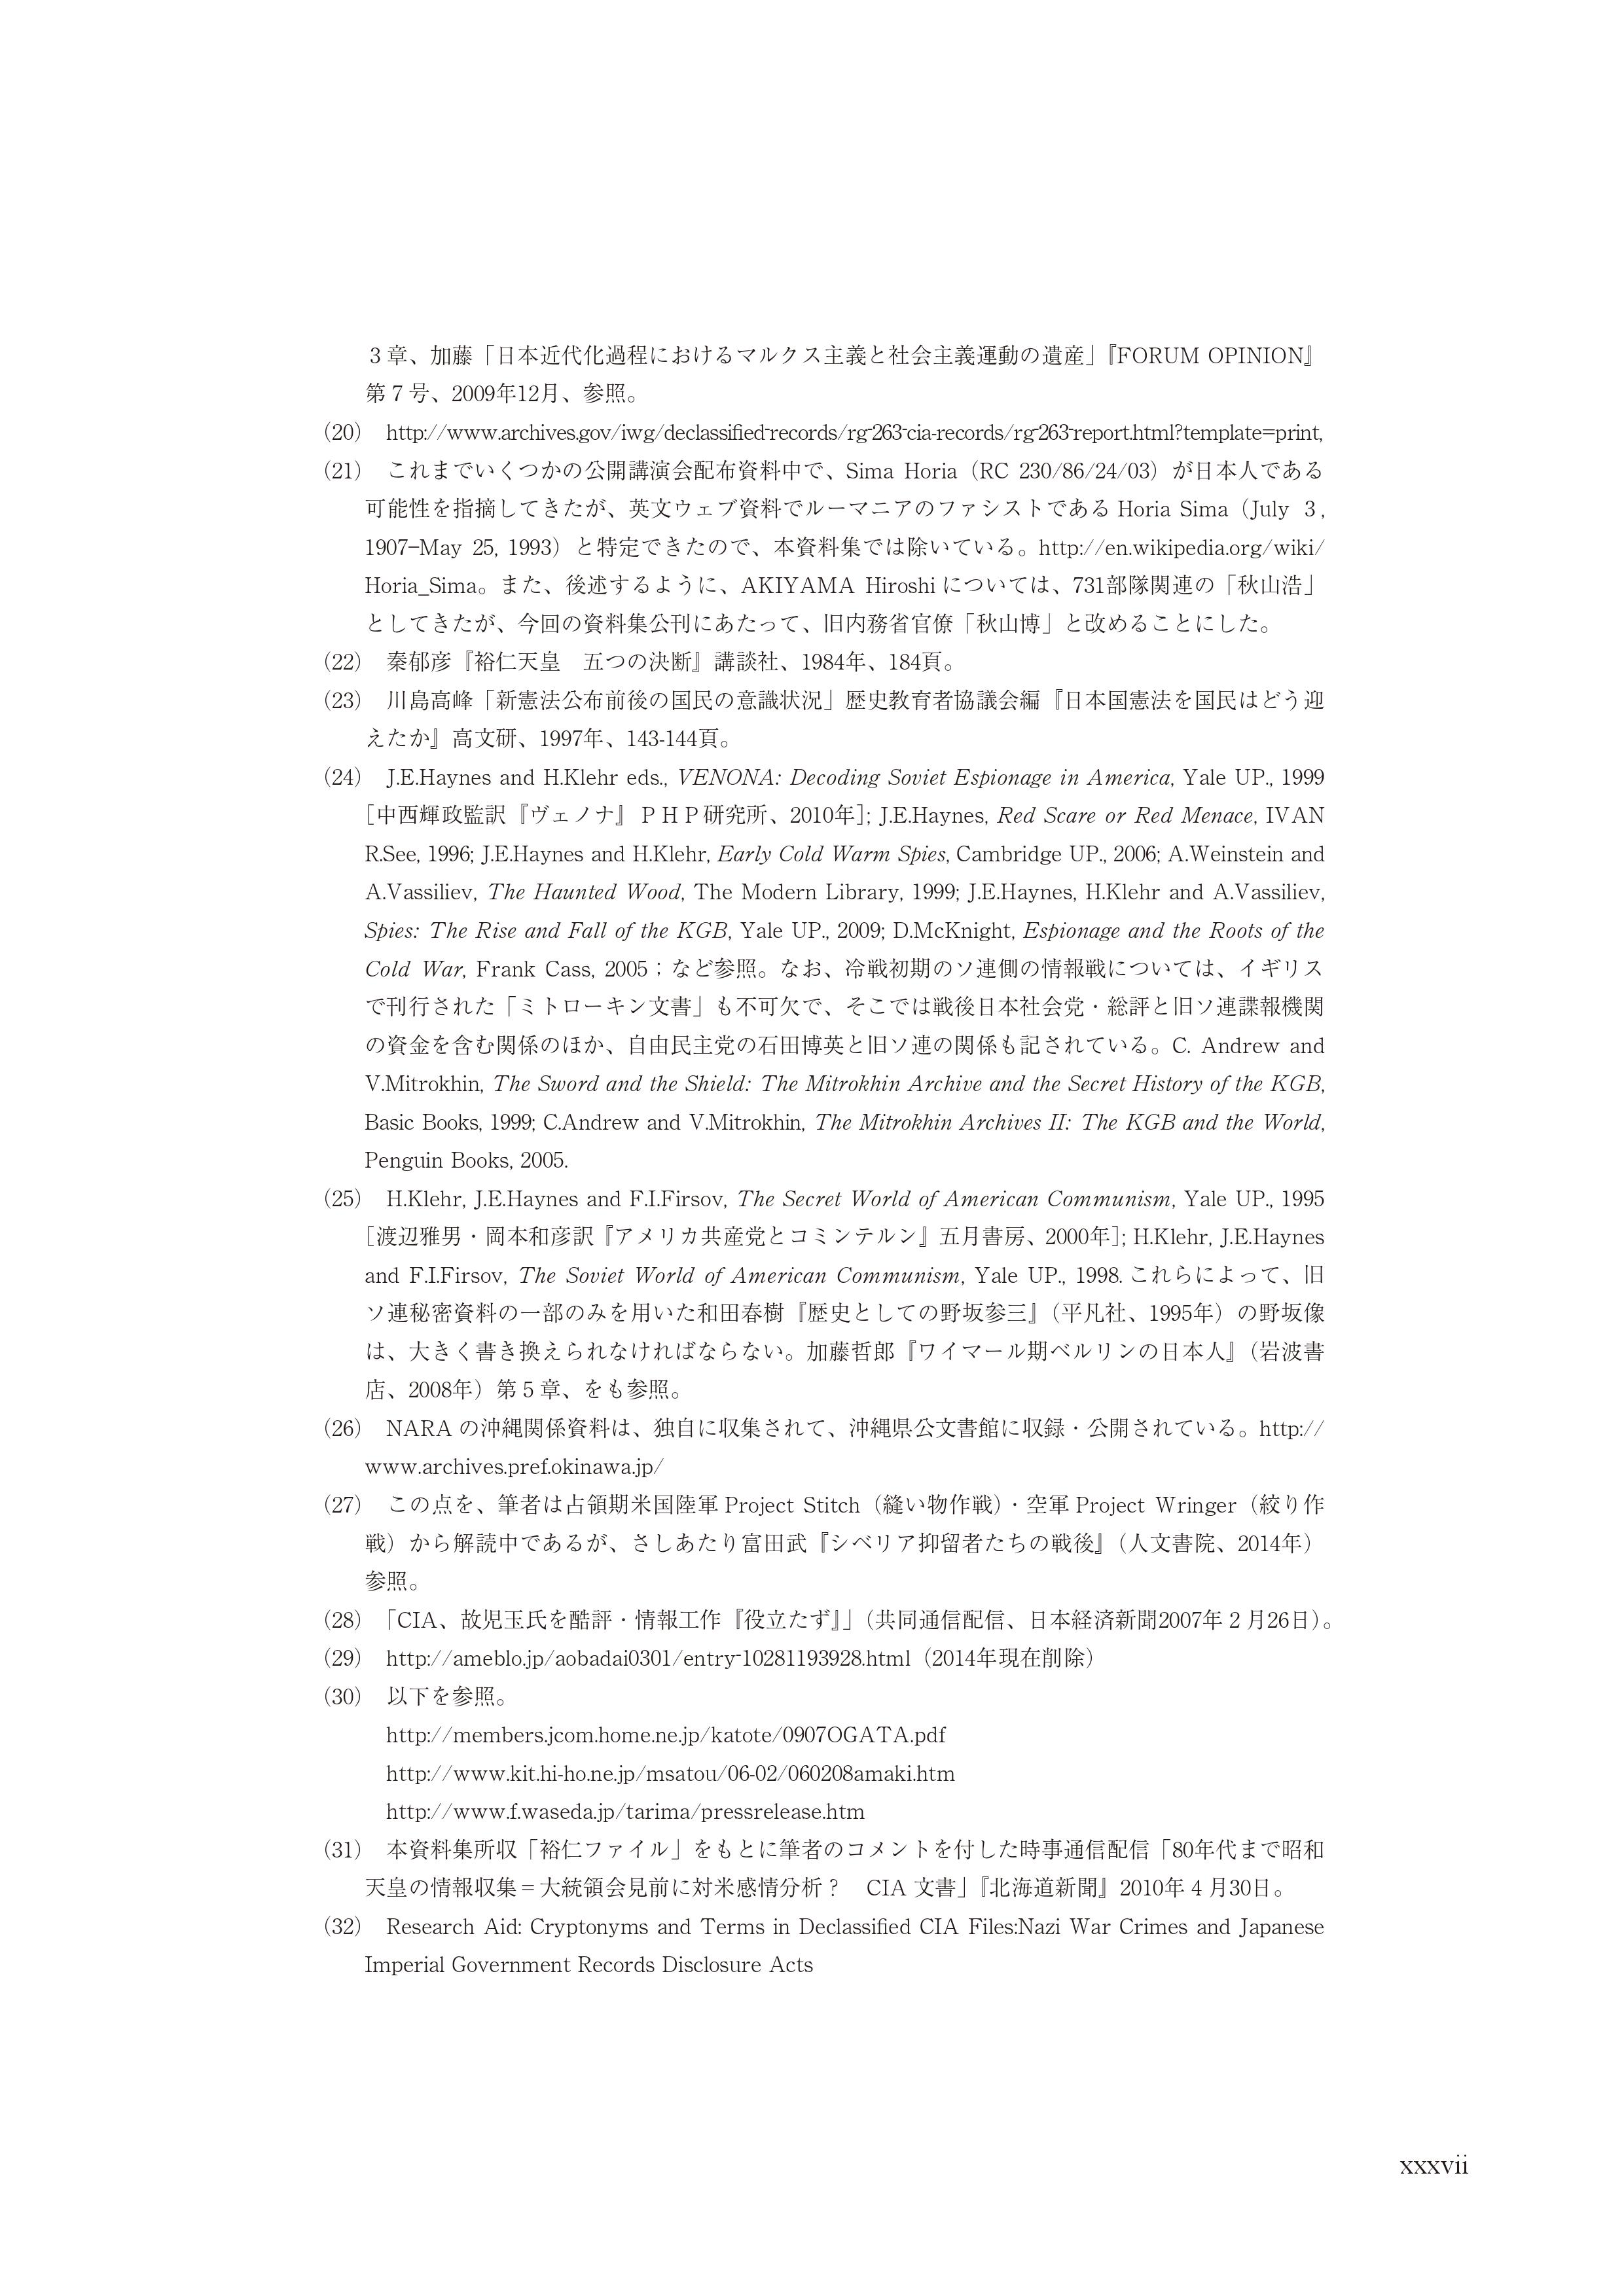 CIA日本人ファイル0001 (37)